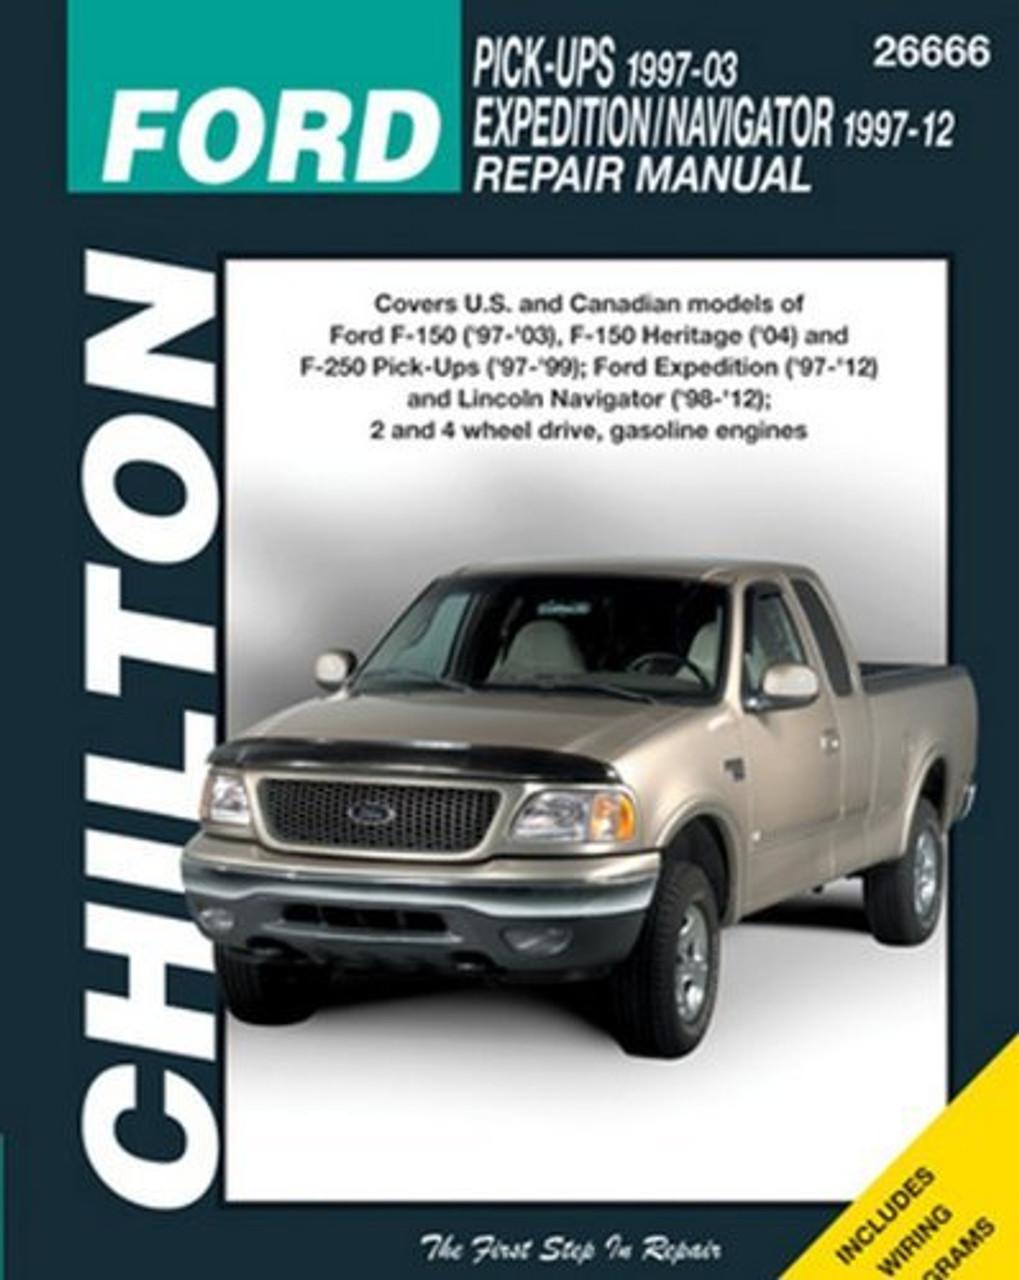 sainchargny.com 1998-2014 Toyota Lexus Transmission Repair Manual ...